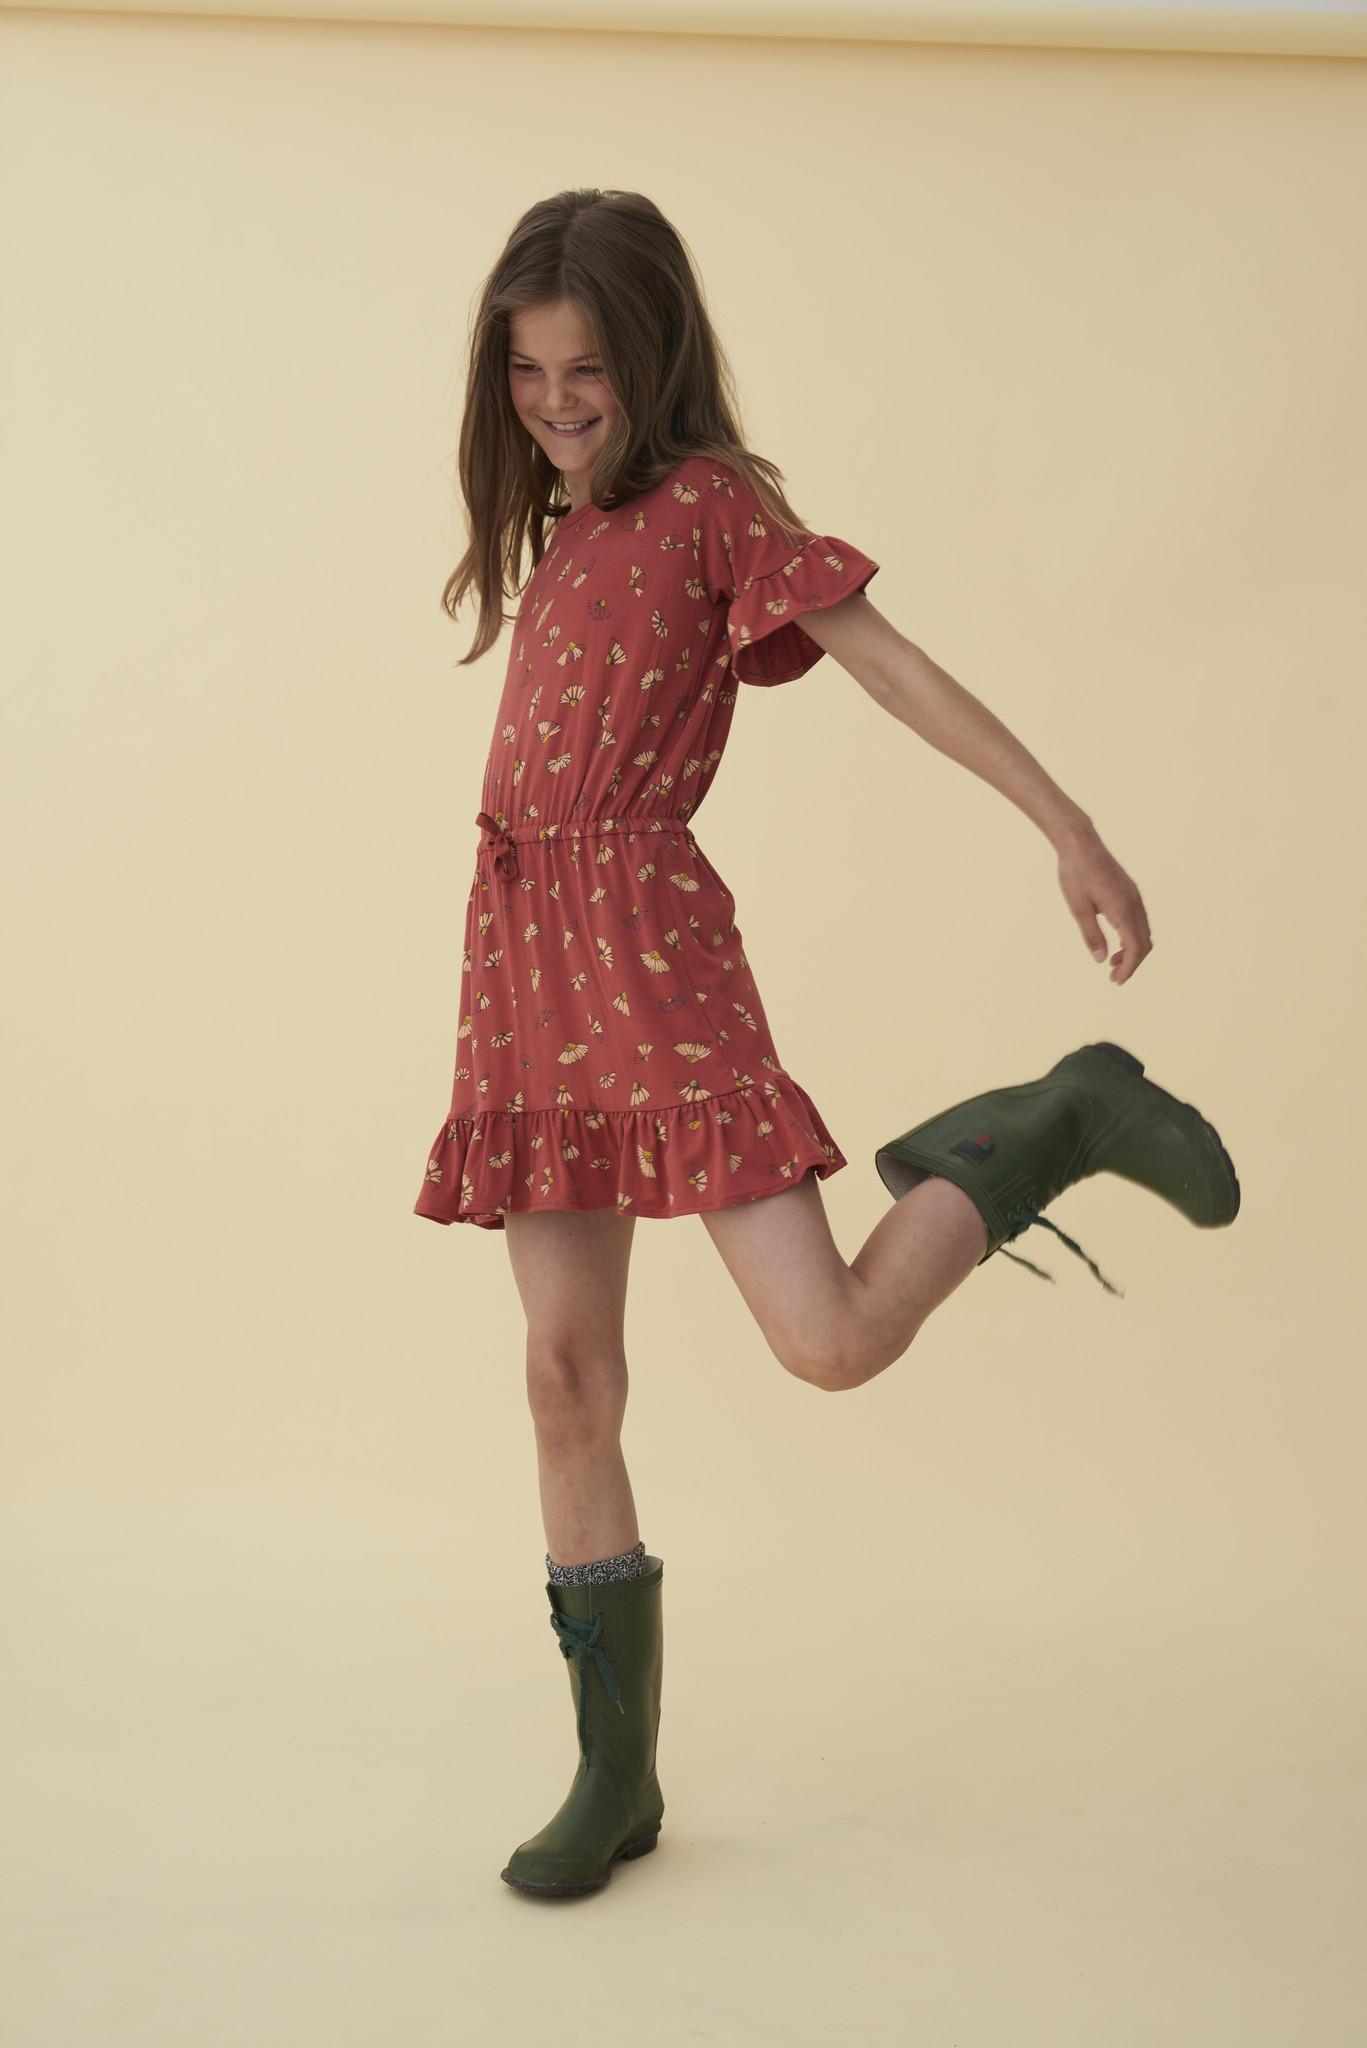 Danica dress - Burnt Brick / AOP Camomile-2